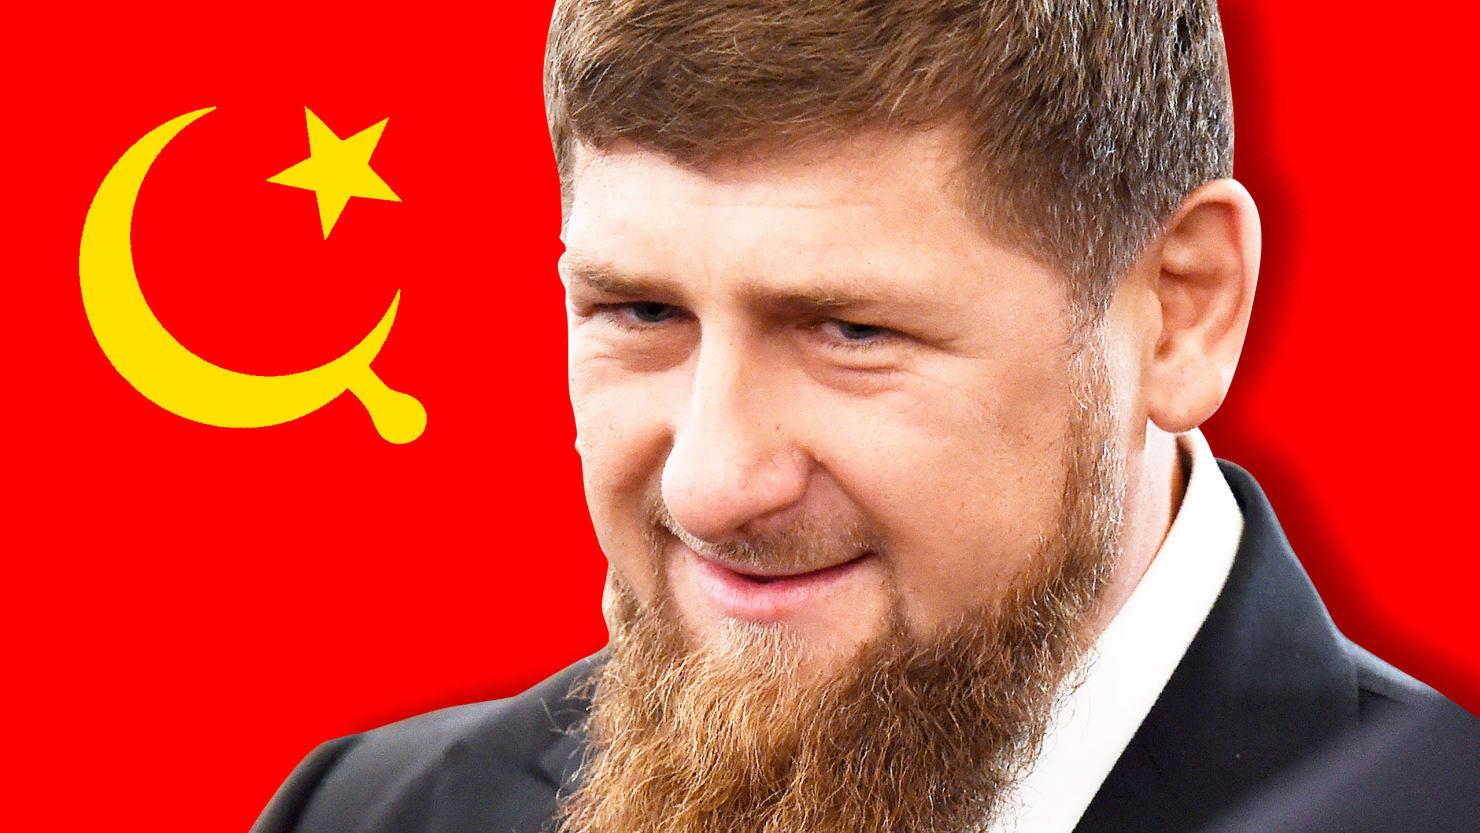 Chechen Ramzan Kadyrov makes a power play, pushing Putin to intervene in Burma. But that's only the beginning.